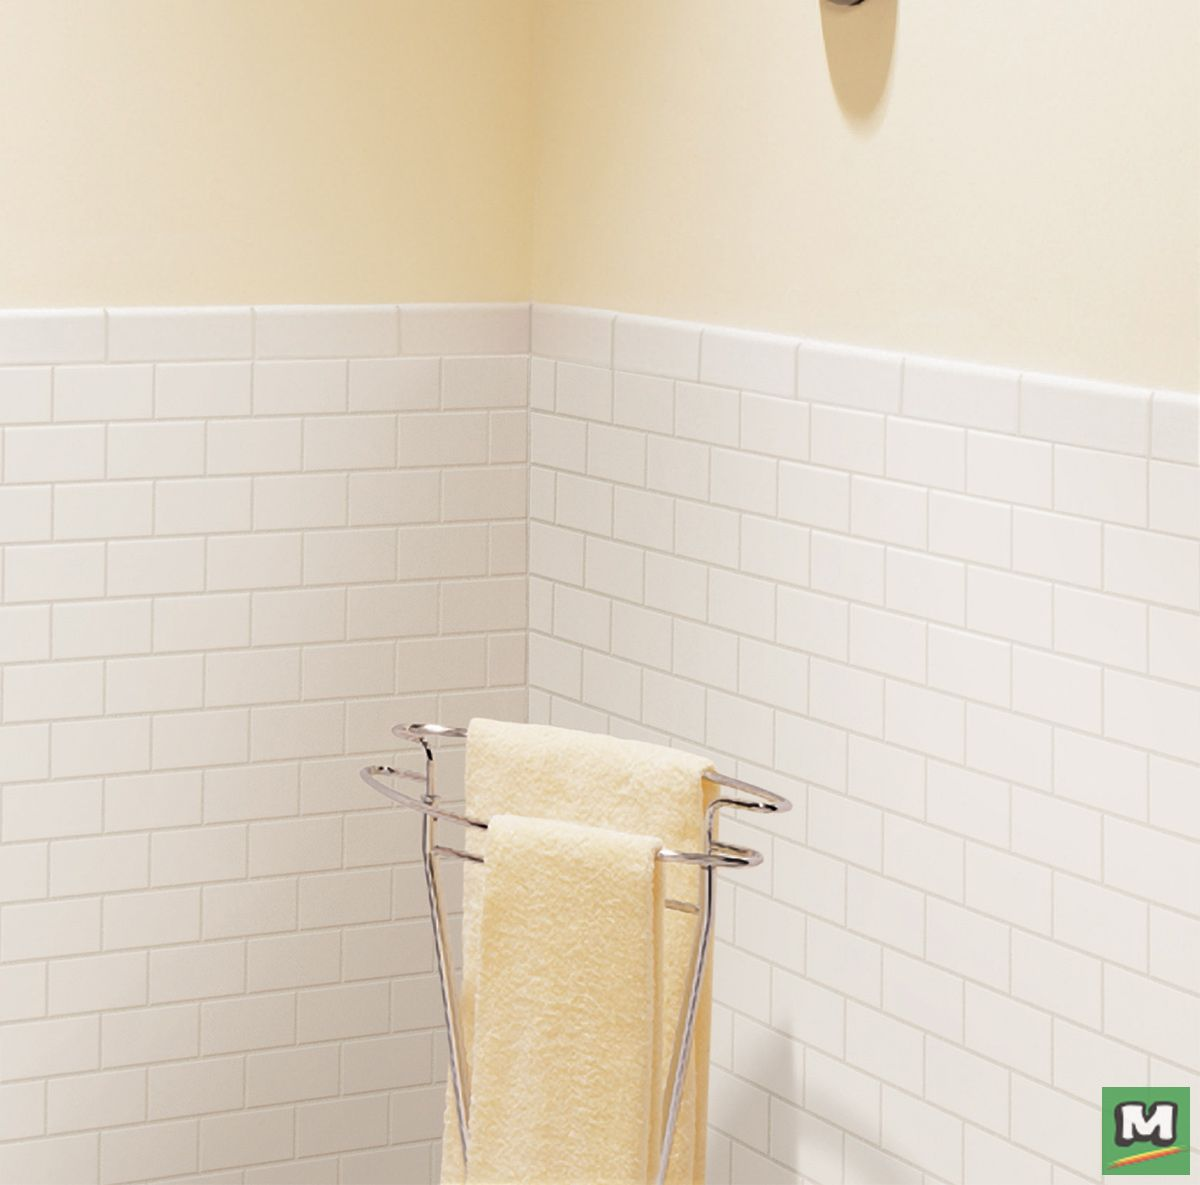 - Flexible In Both Style And Design, Mohawk® Vivant Gloss White